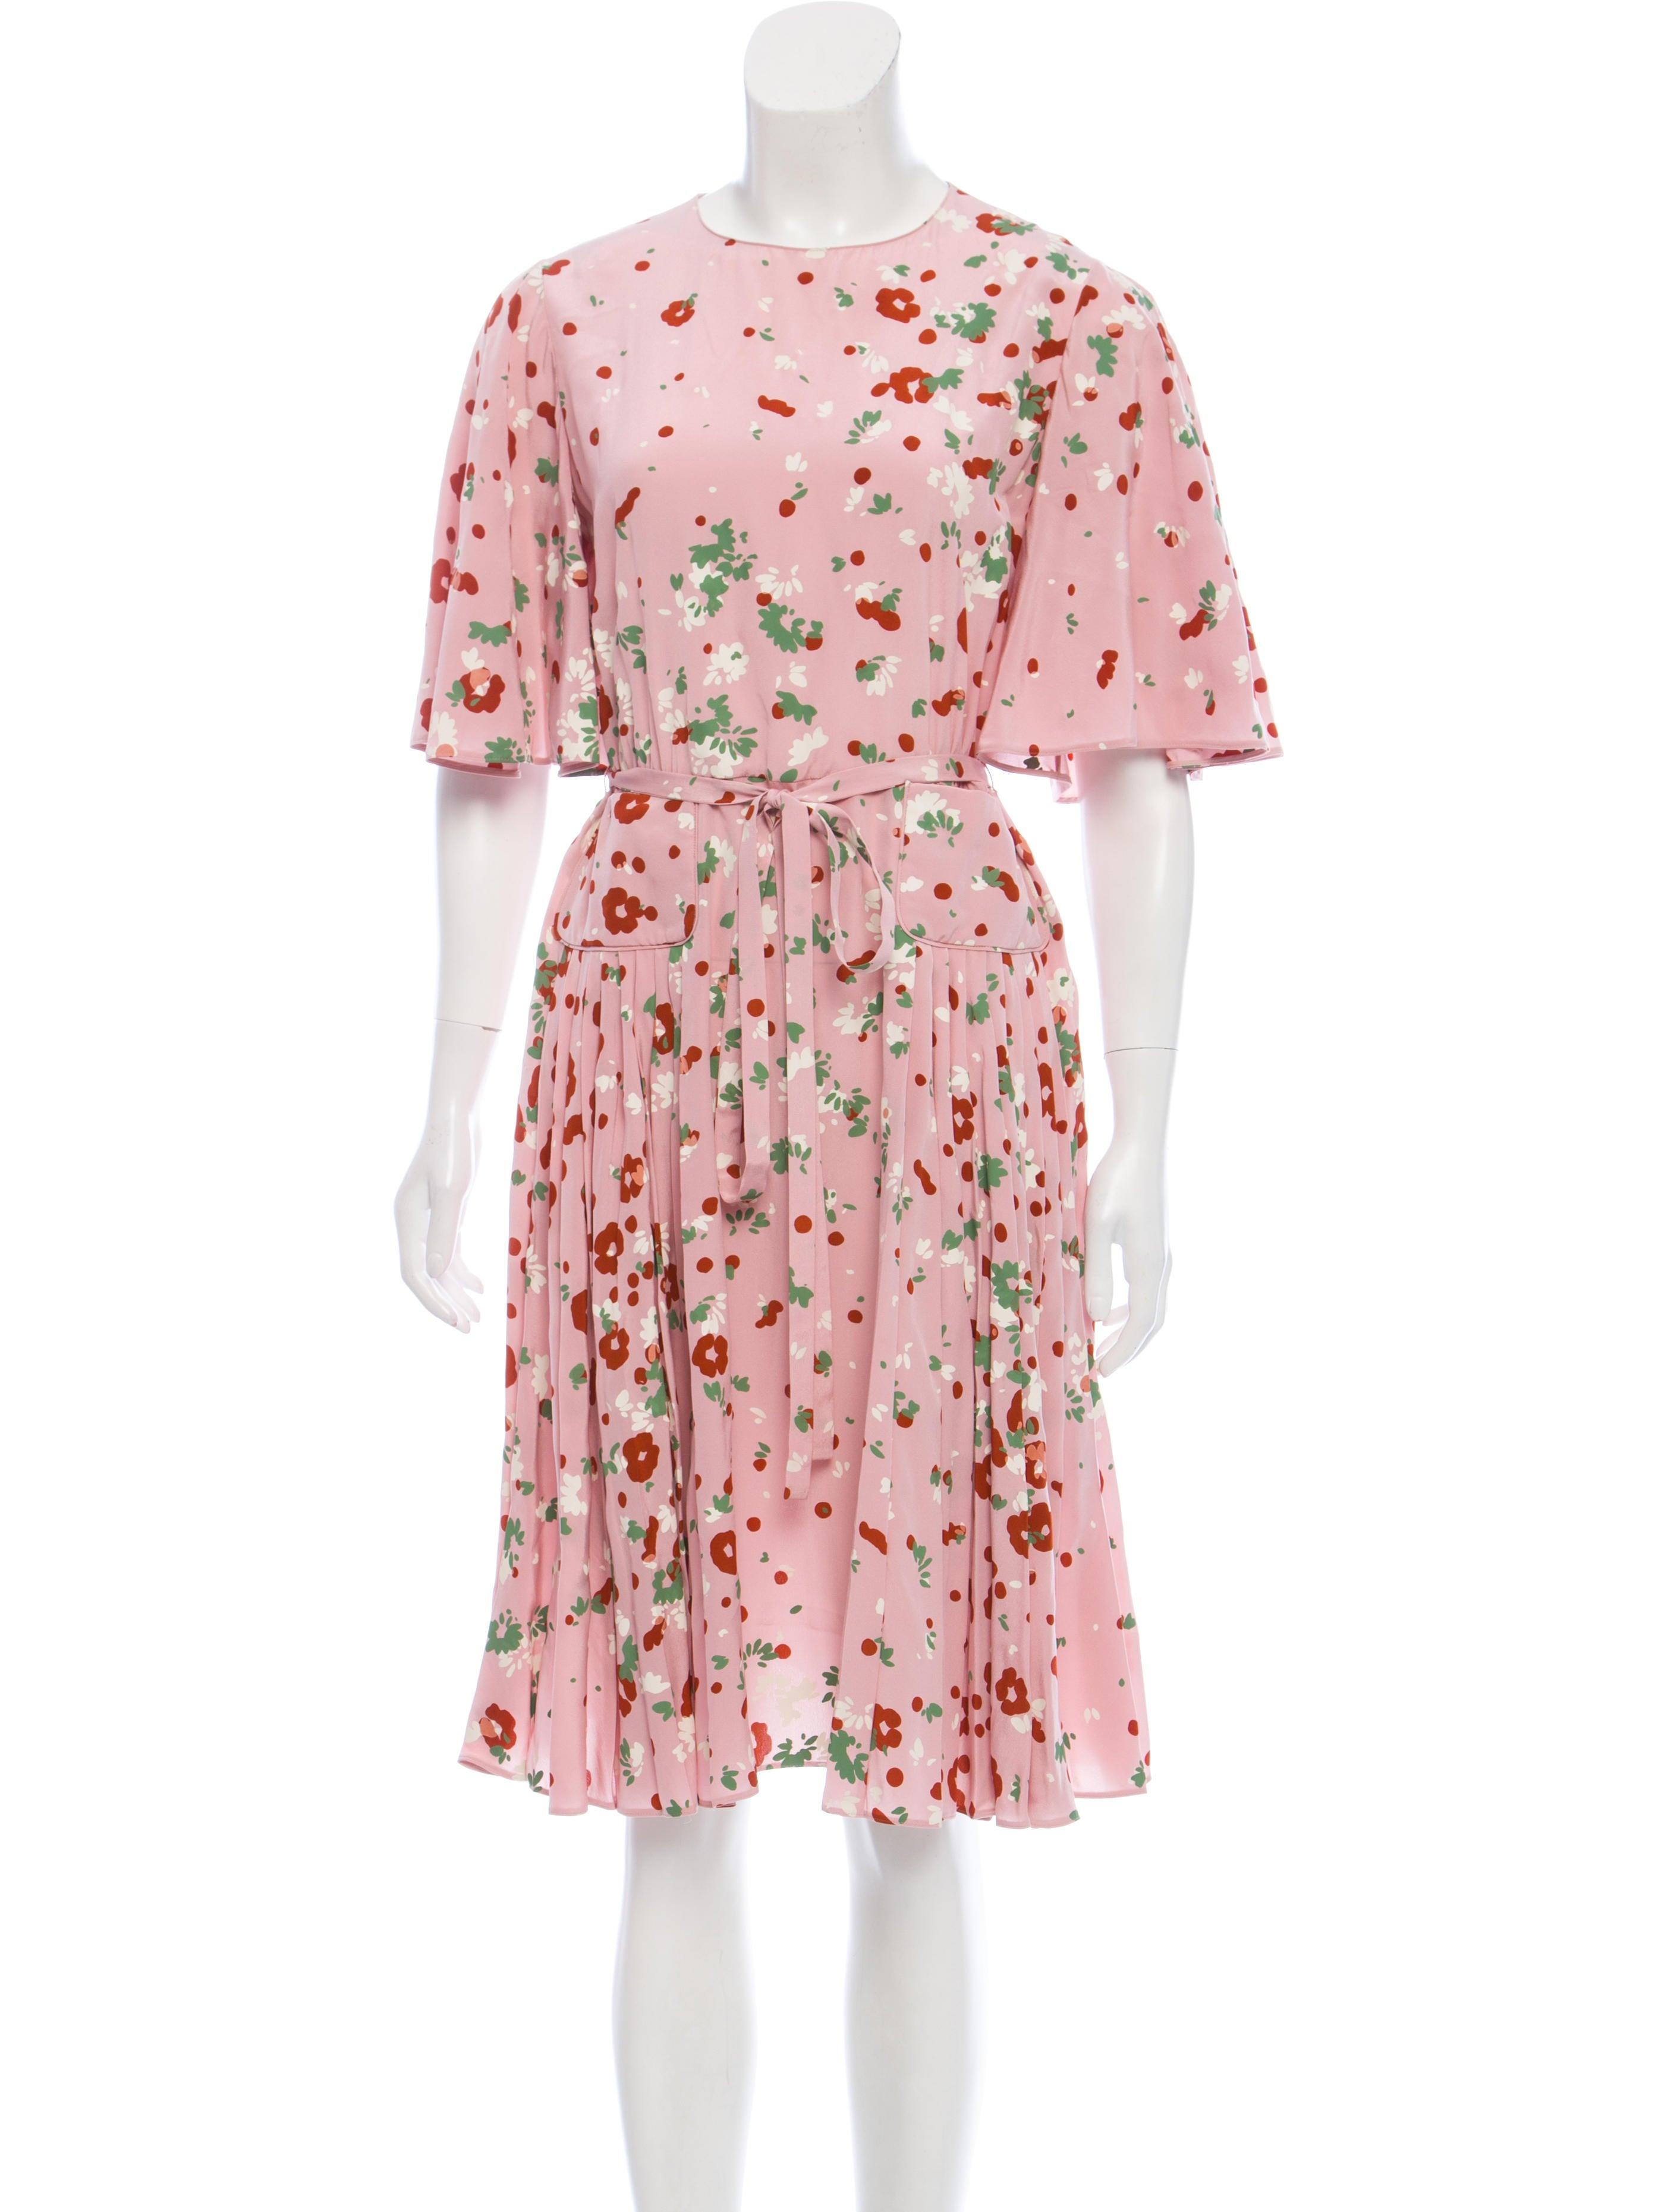 67c0f7cef94 Valentino Printed Silk Dress - Clothing - VAL108898